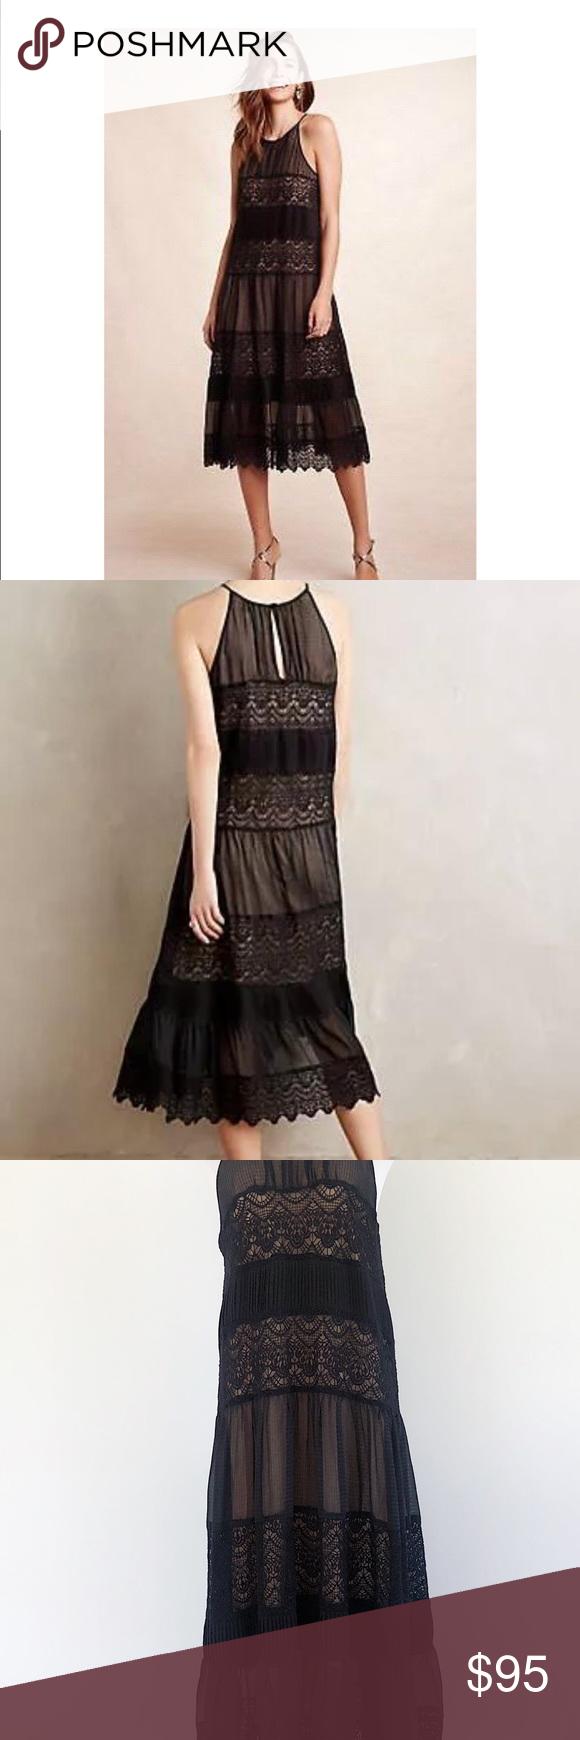 Hd In Paris Villanelle Sheer Black Lace Midi Dress Black Lace Midi Dress Lace Midi Dress Black Sheer Dress [ 1740 x 580 Pixel ]